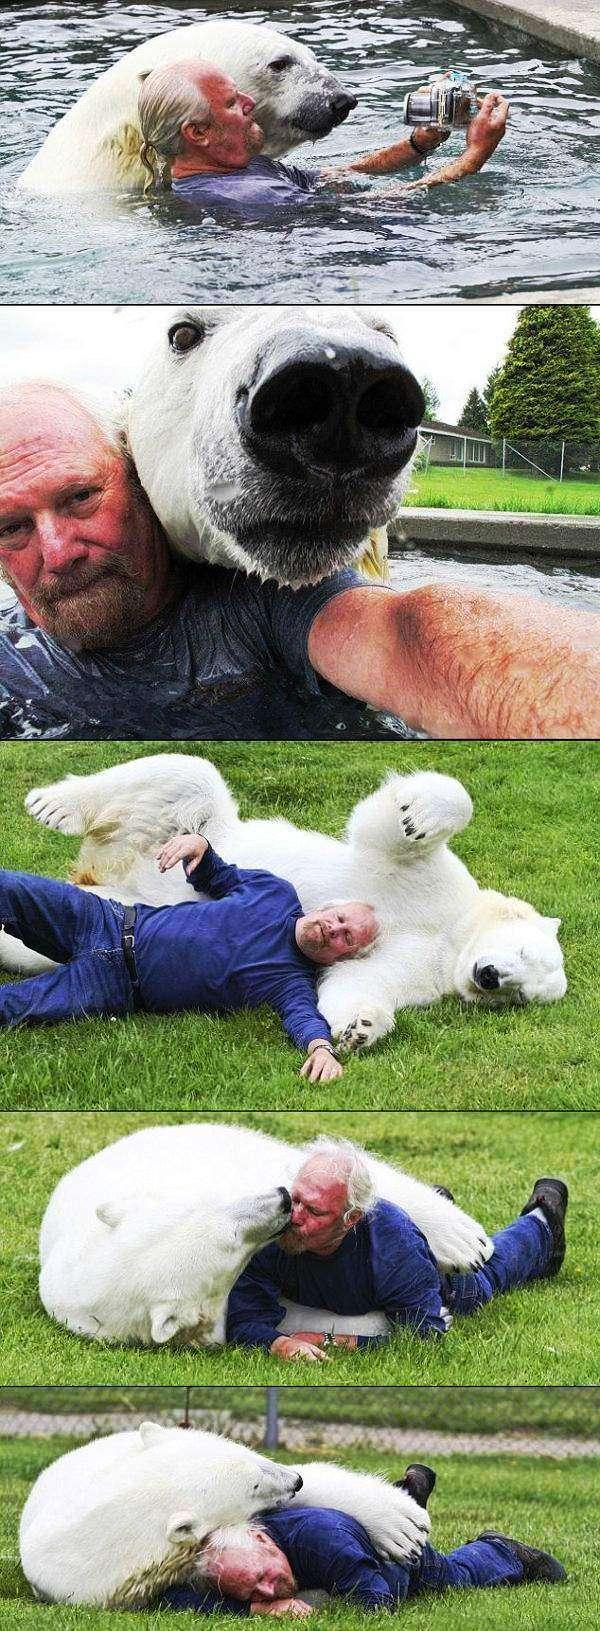 benefits-polar-bear-zookeeper